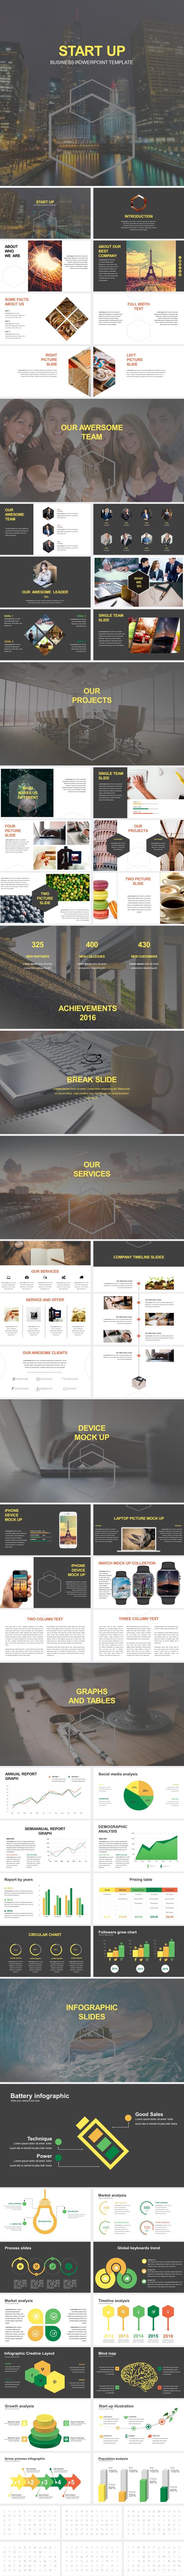 Start Up Business Powerpoint Template - Business PowerPoint Templates